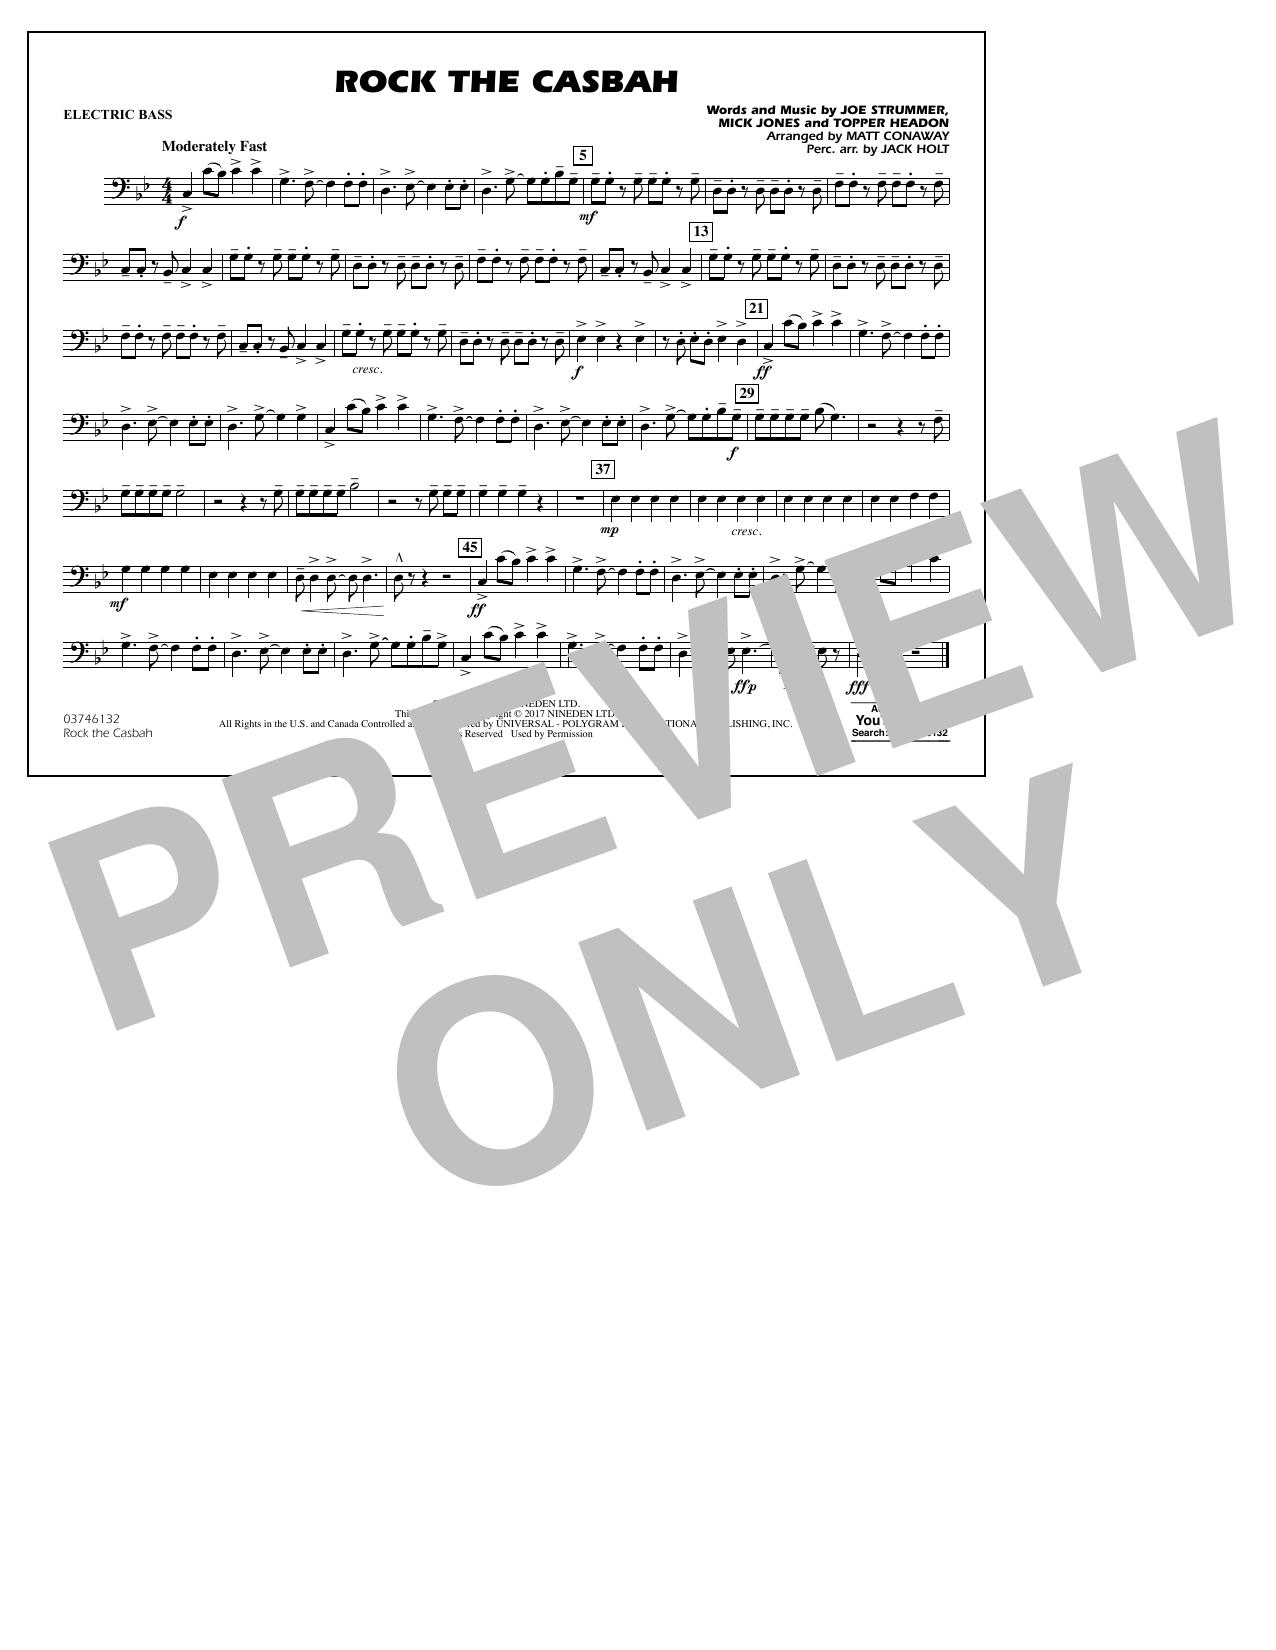 Rock the Casbah - Electric Bass Sheet Music